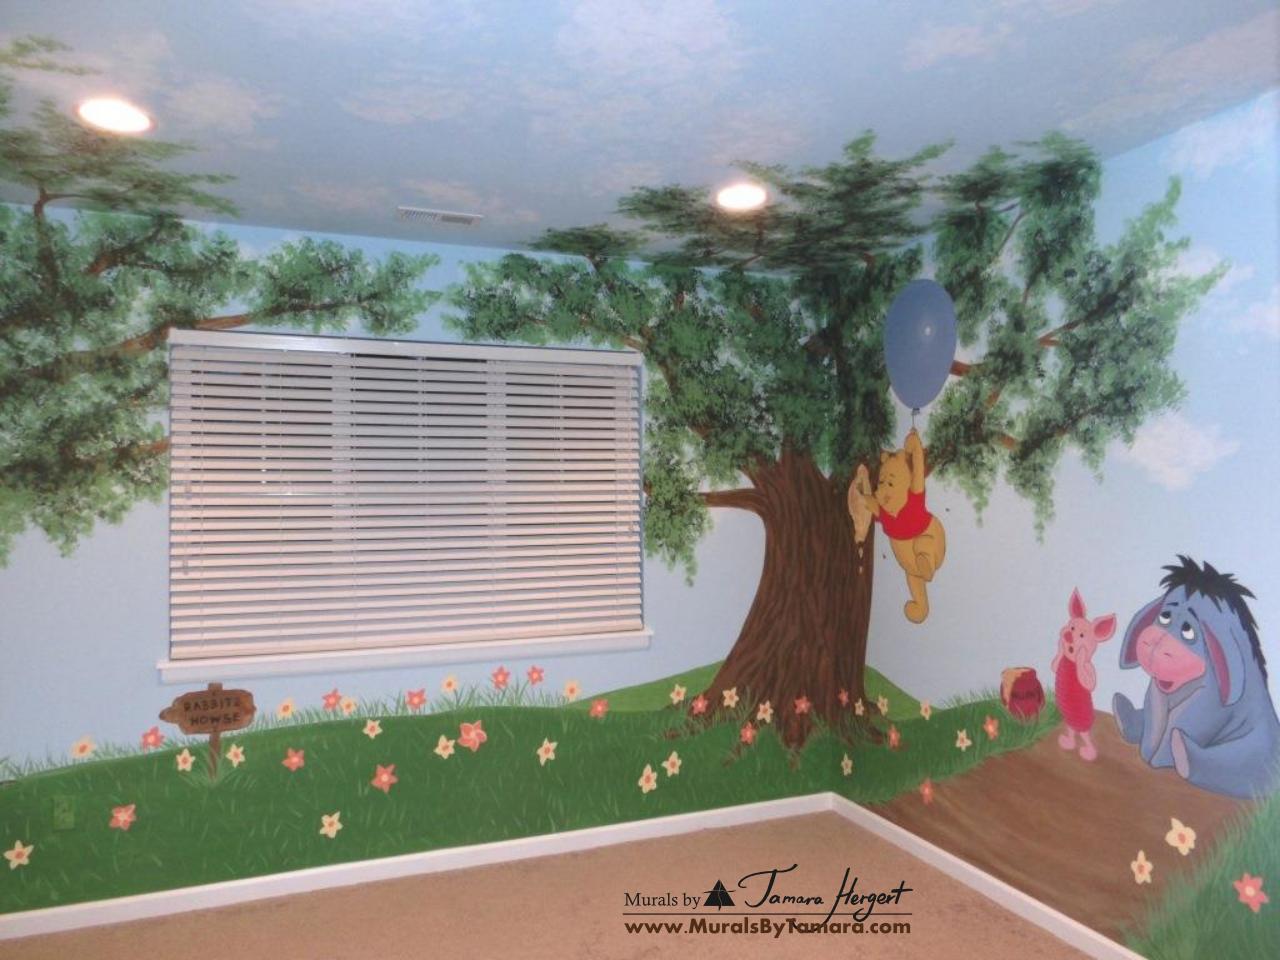 Winnie the Pooh mural front view - kids room mural by Tamara Hergert